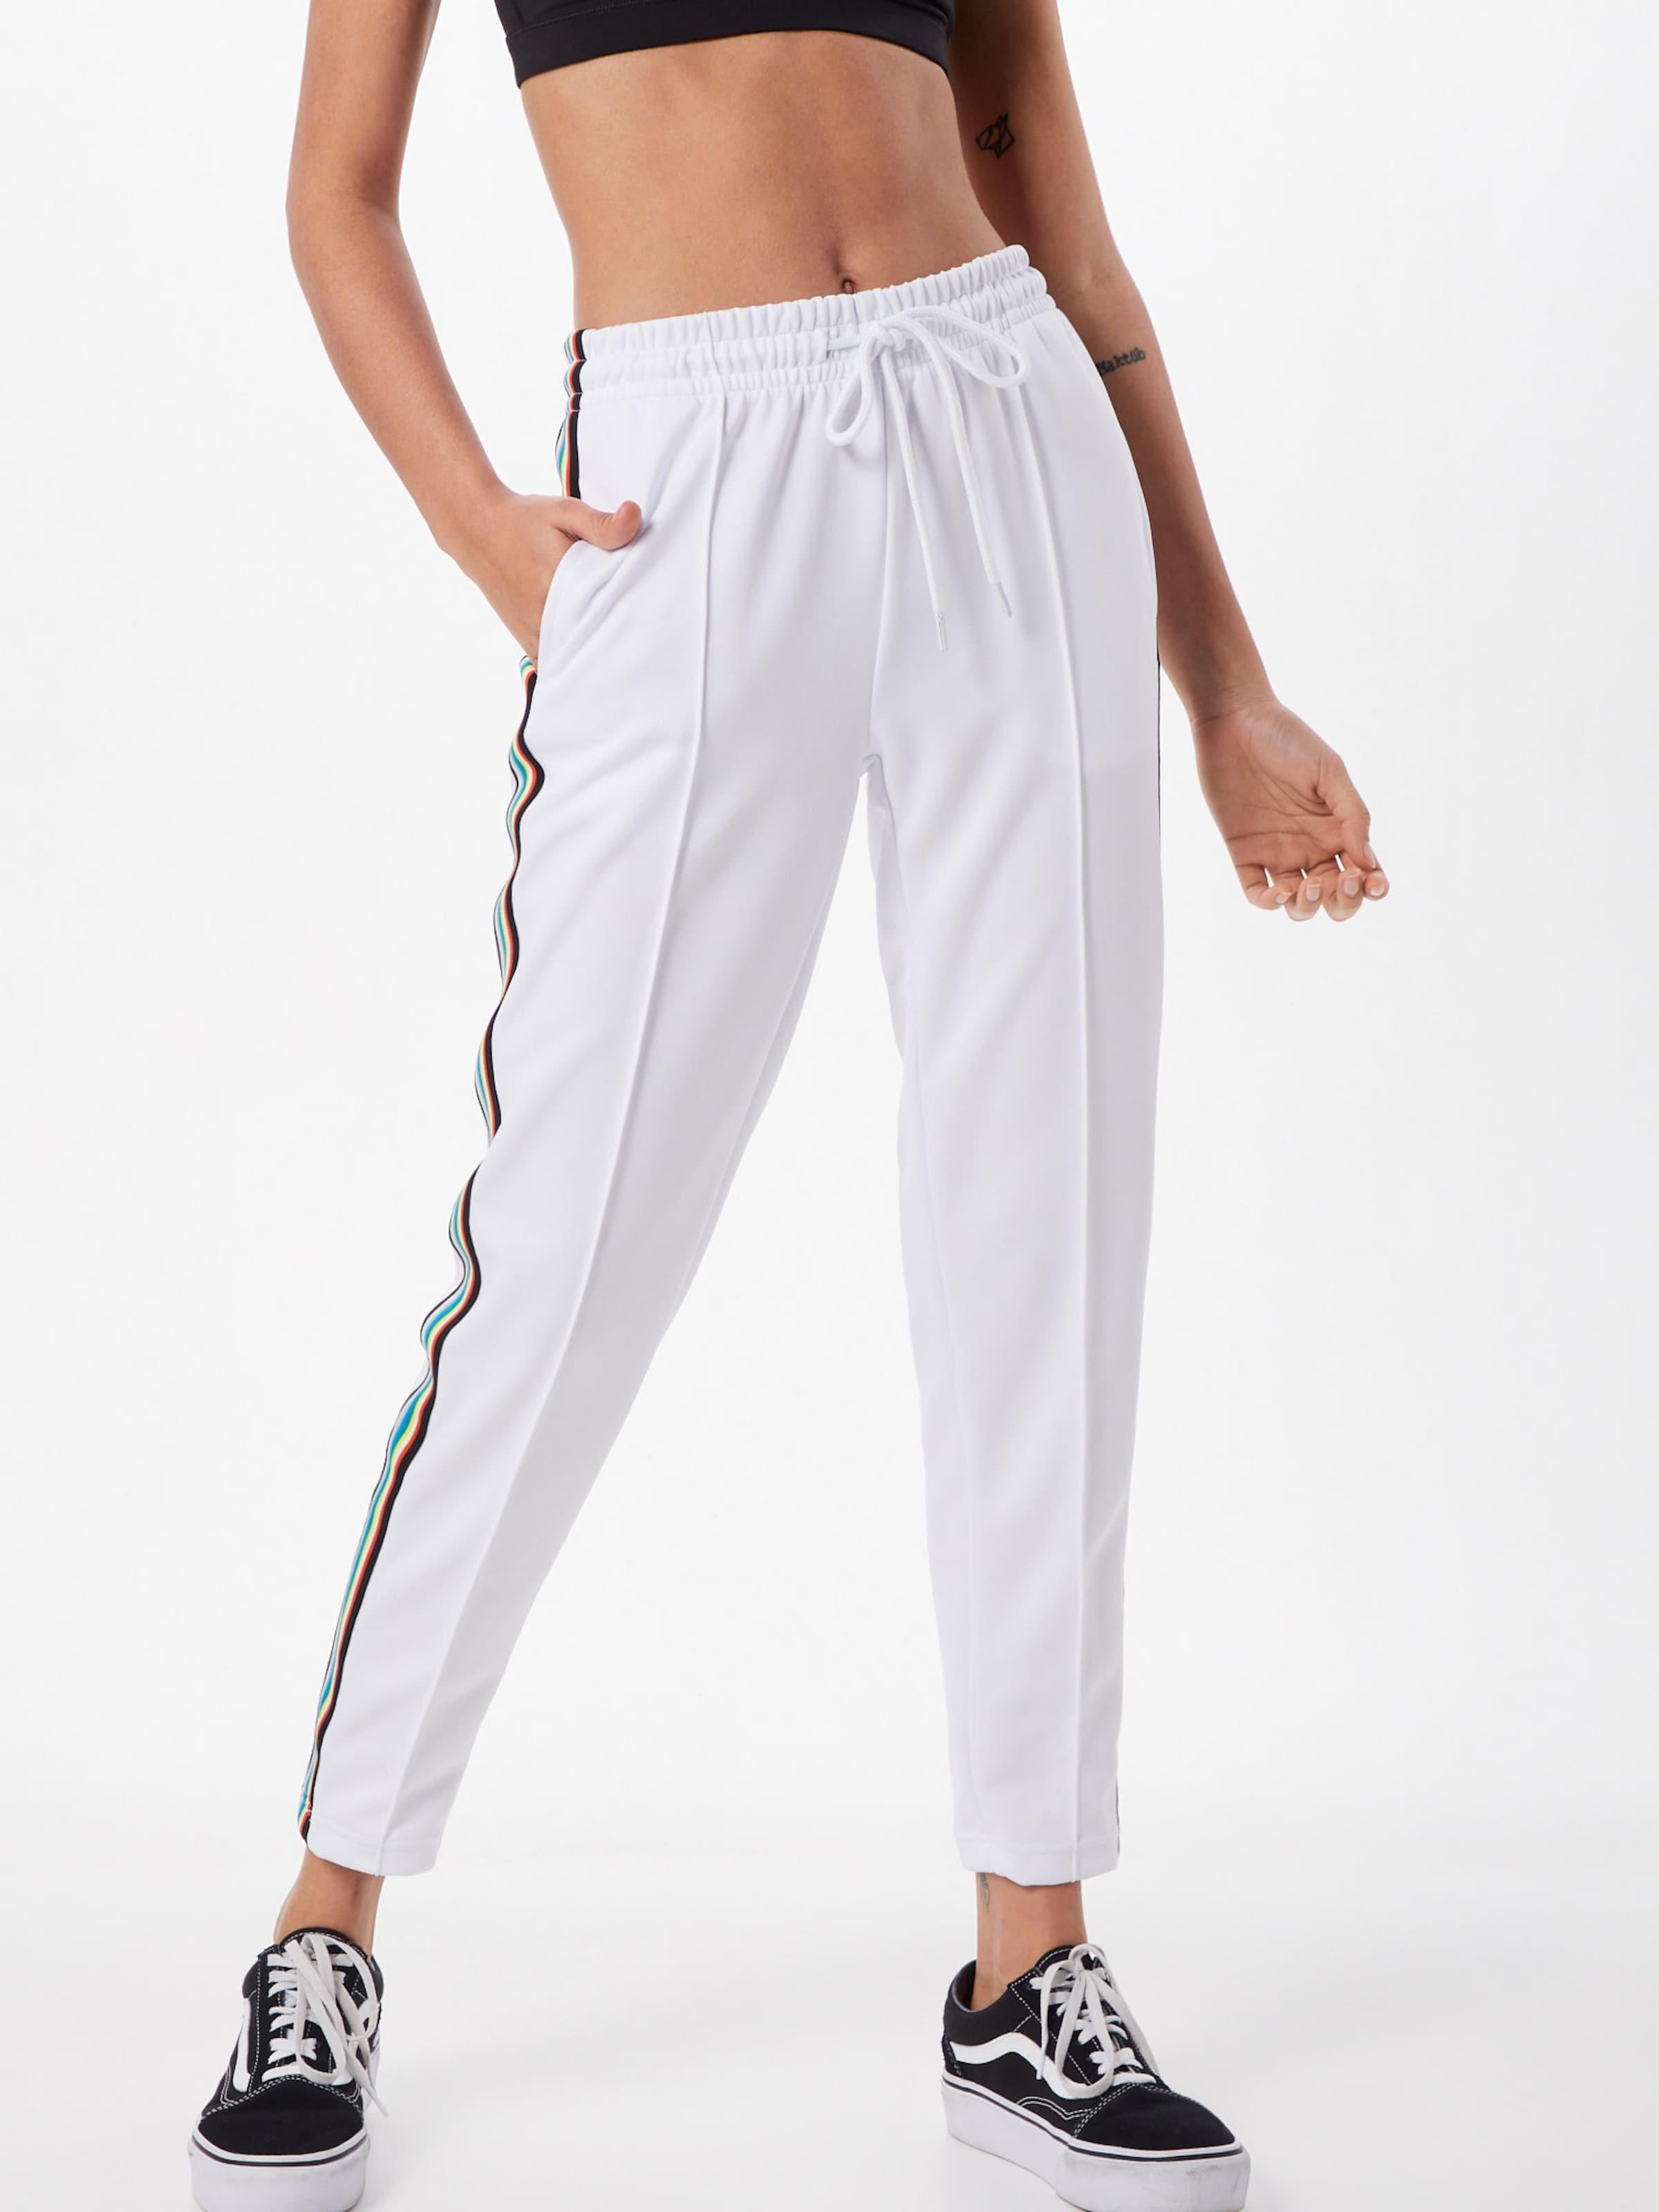 Pantalon Classics Blanc En Urban 3qL5R4Aj